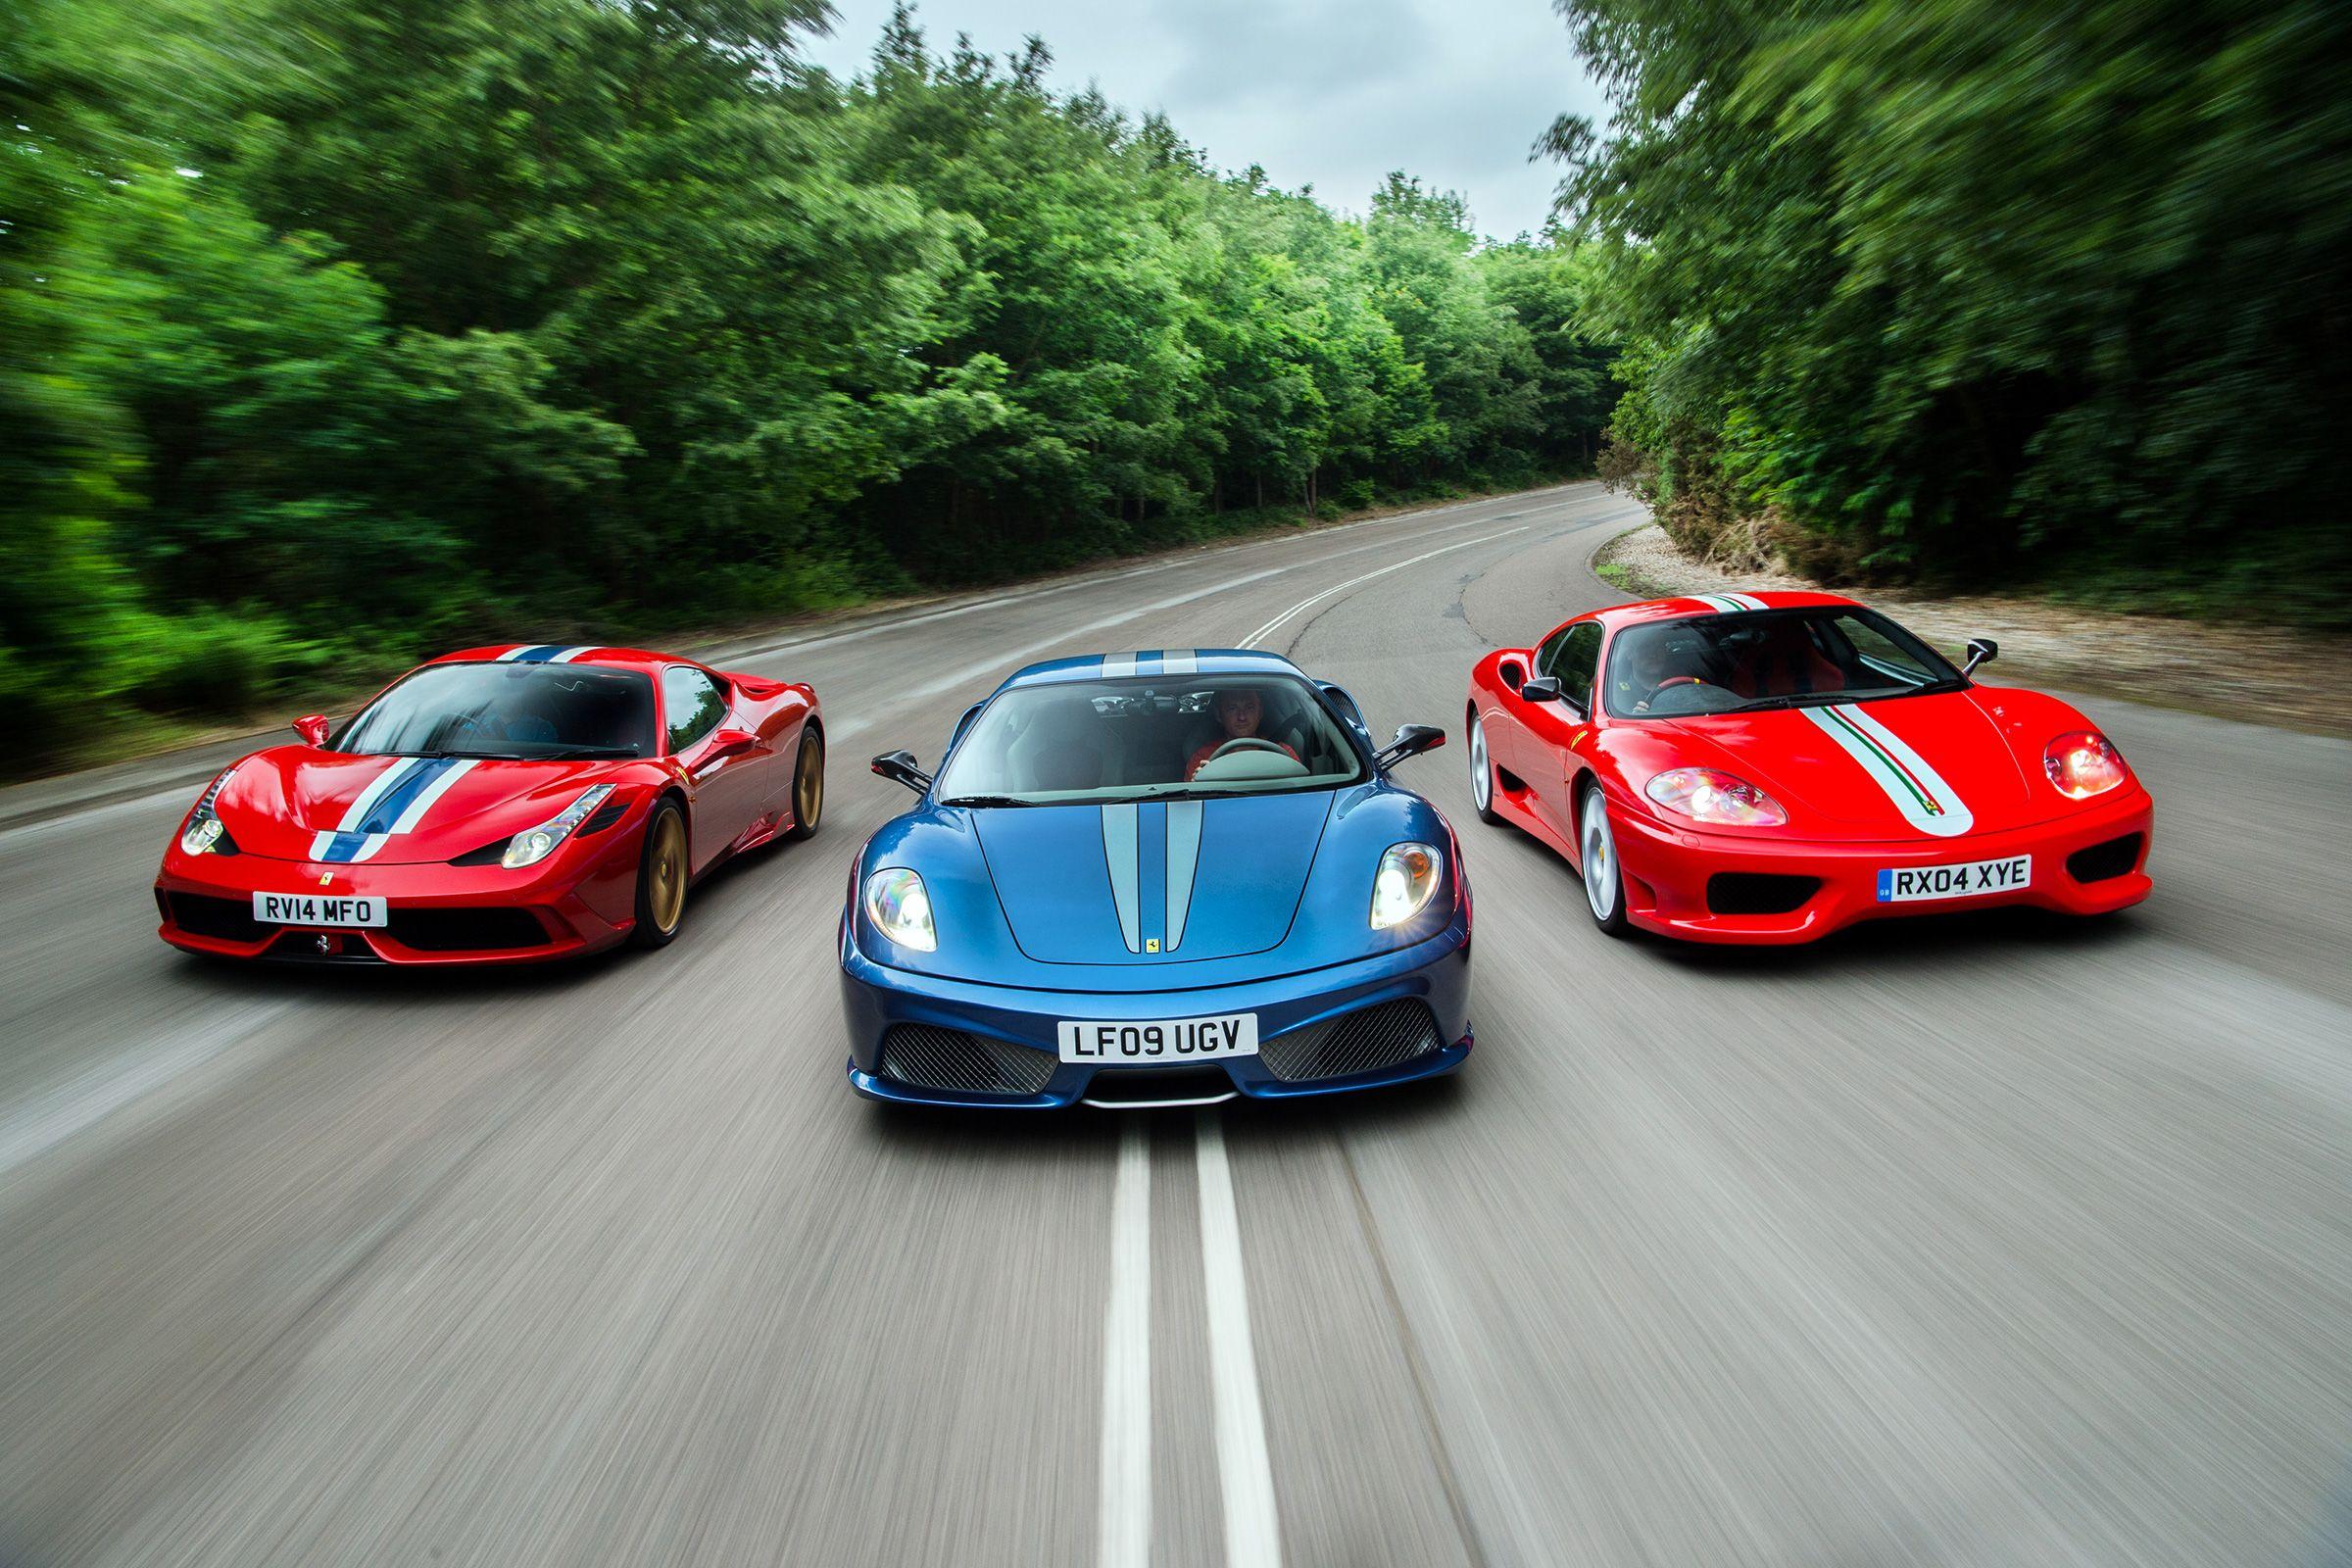 Ferrari Lightweight Specials 458 Speciale Vs 430 Scuderia Vs 360